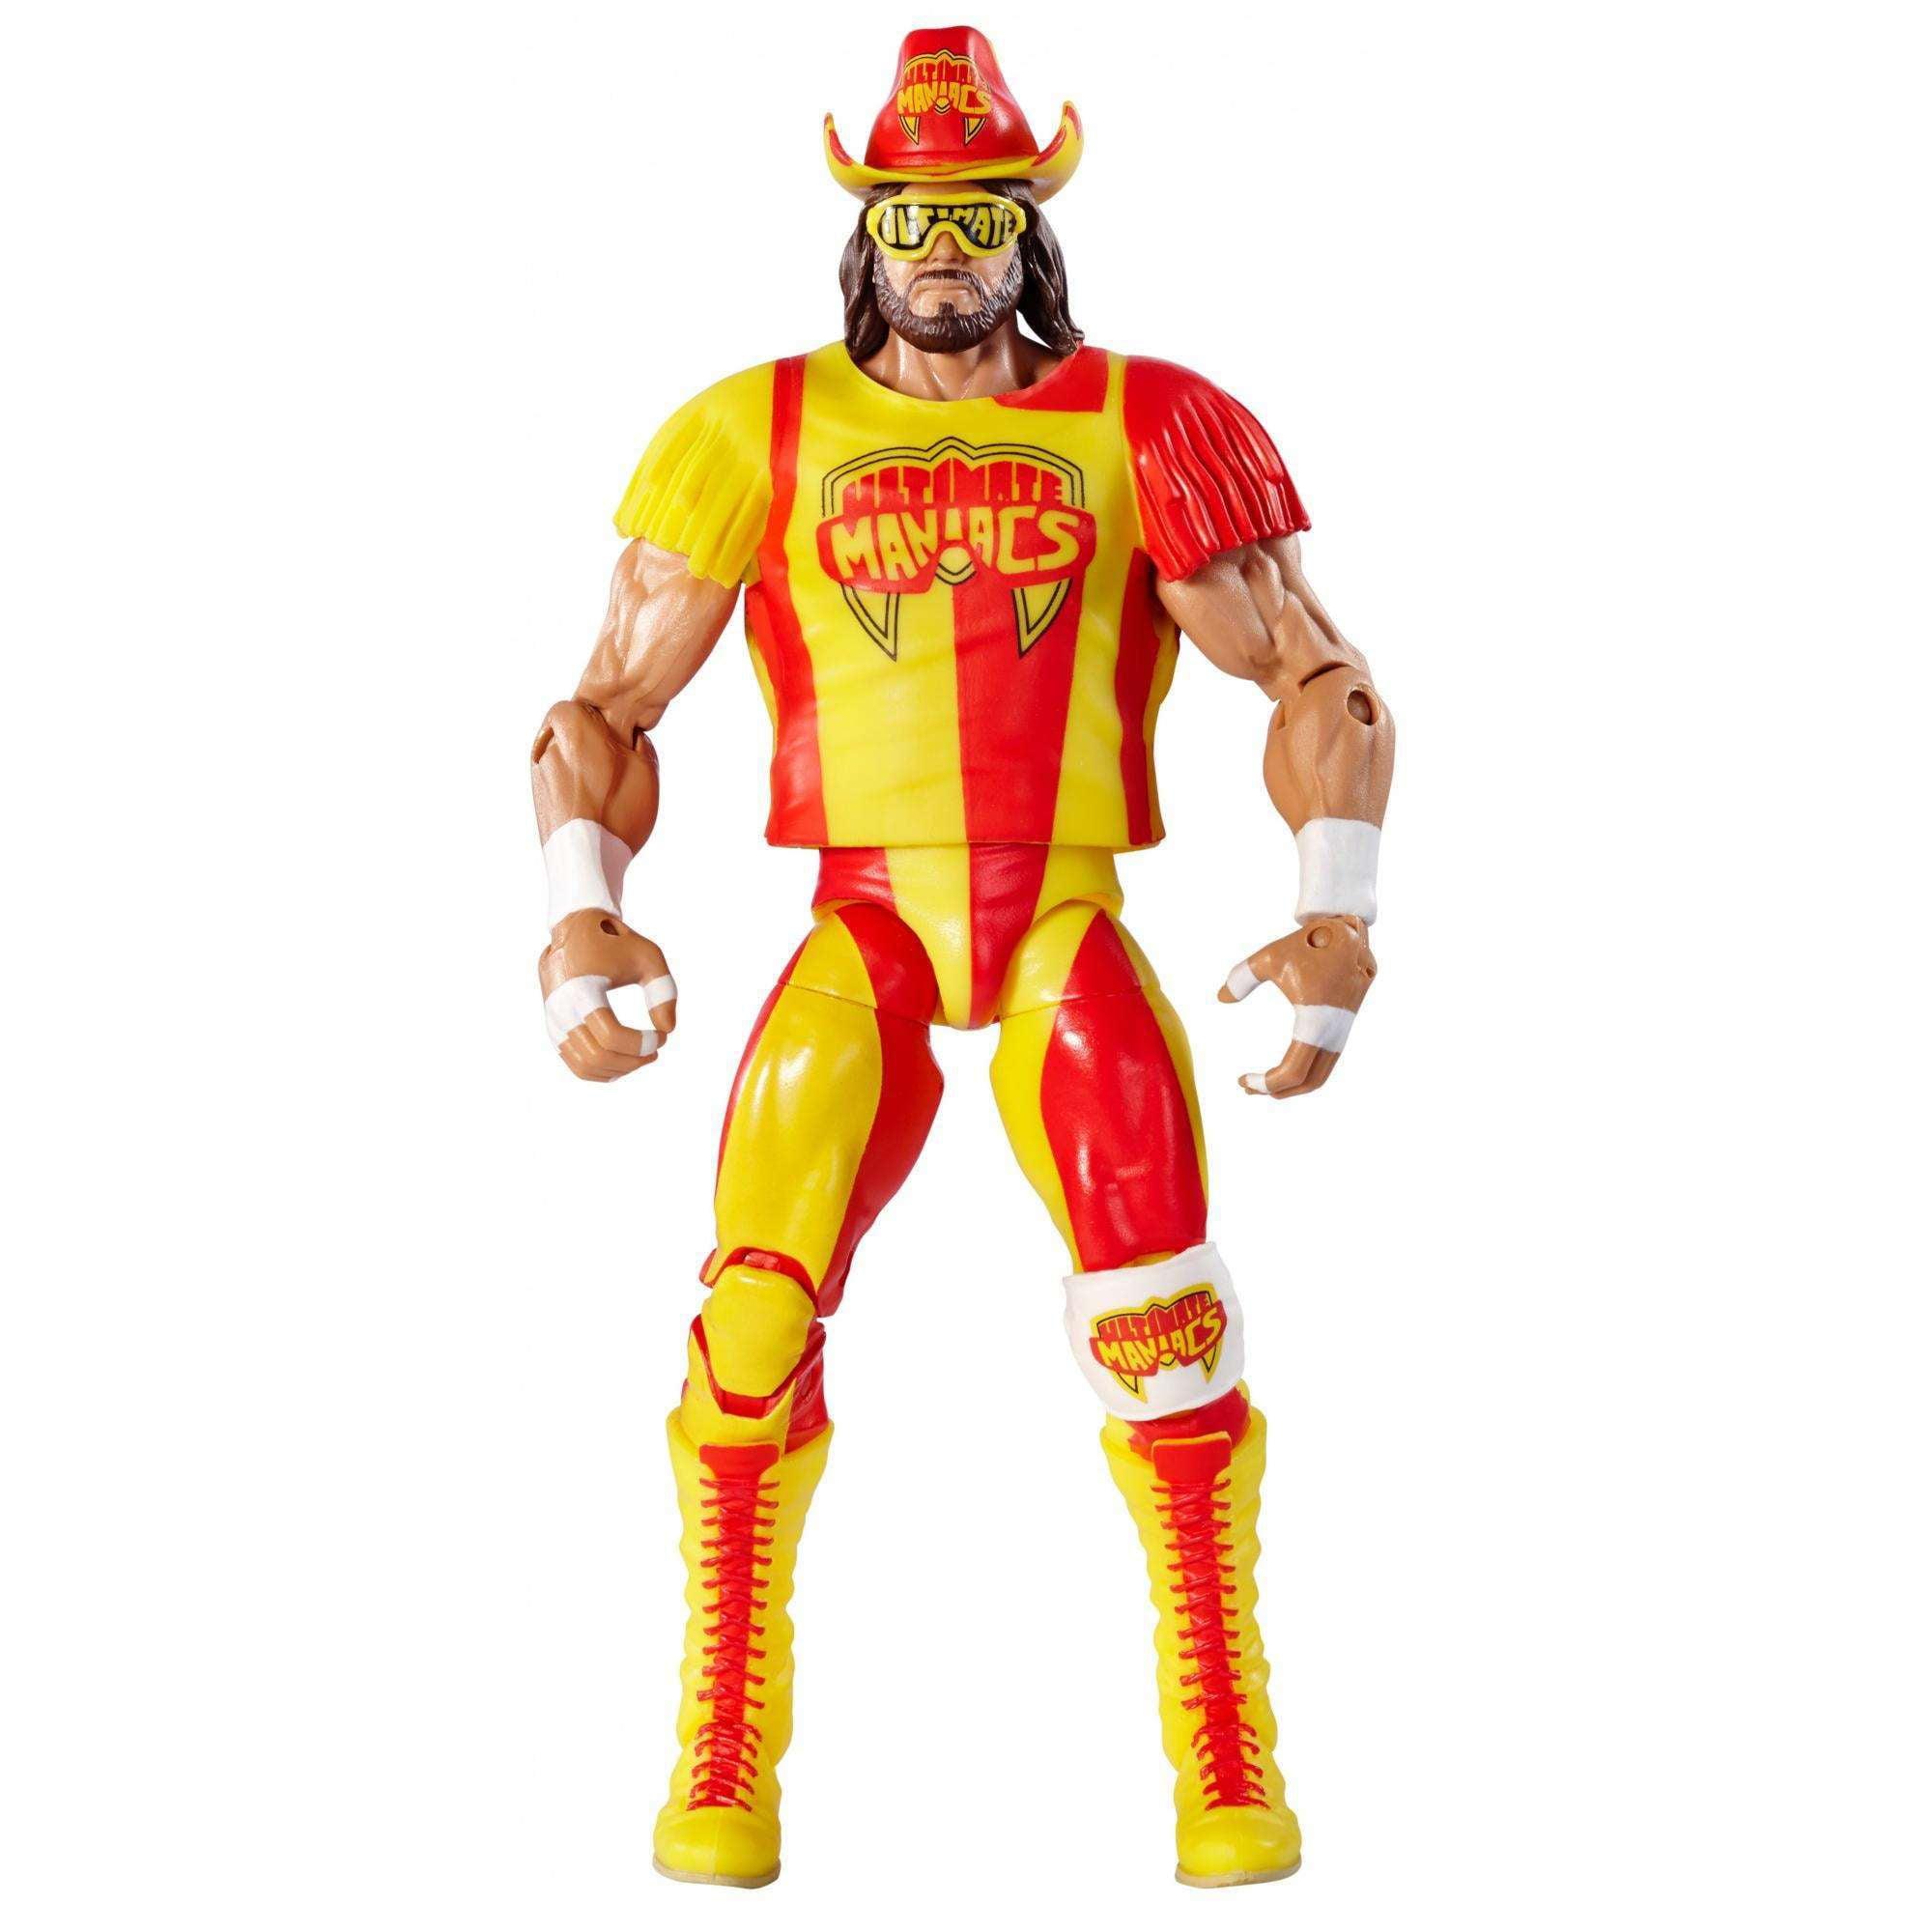 WWE Elite Ultimate Maniac Randy Savage by Mattel